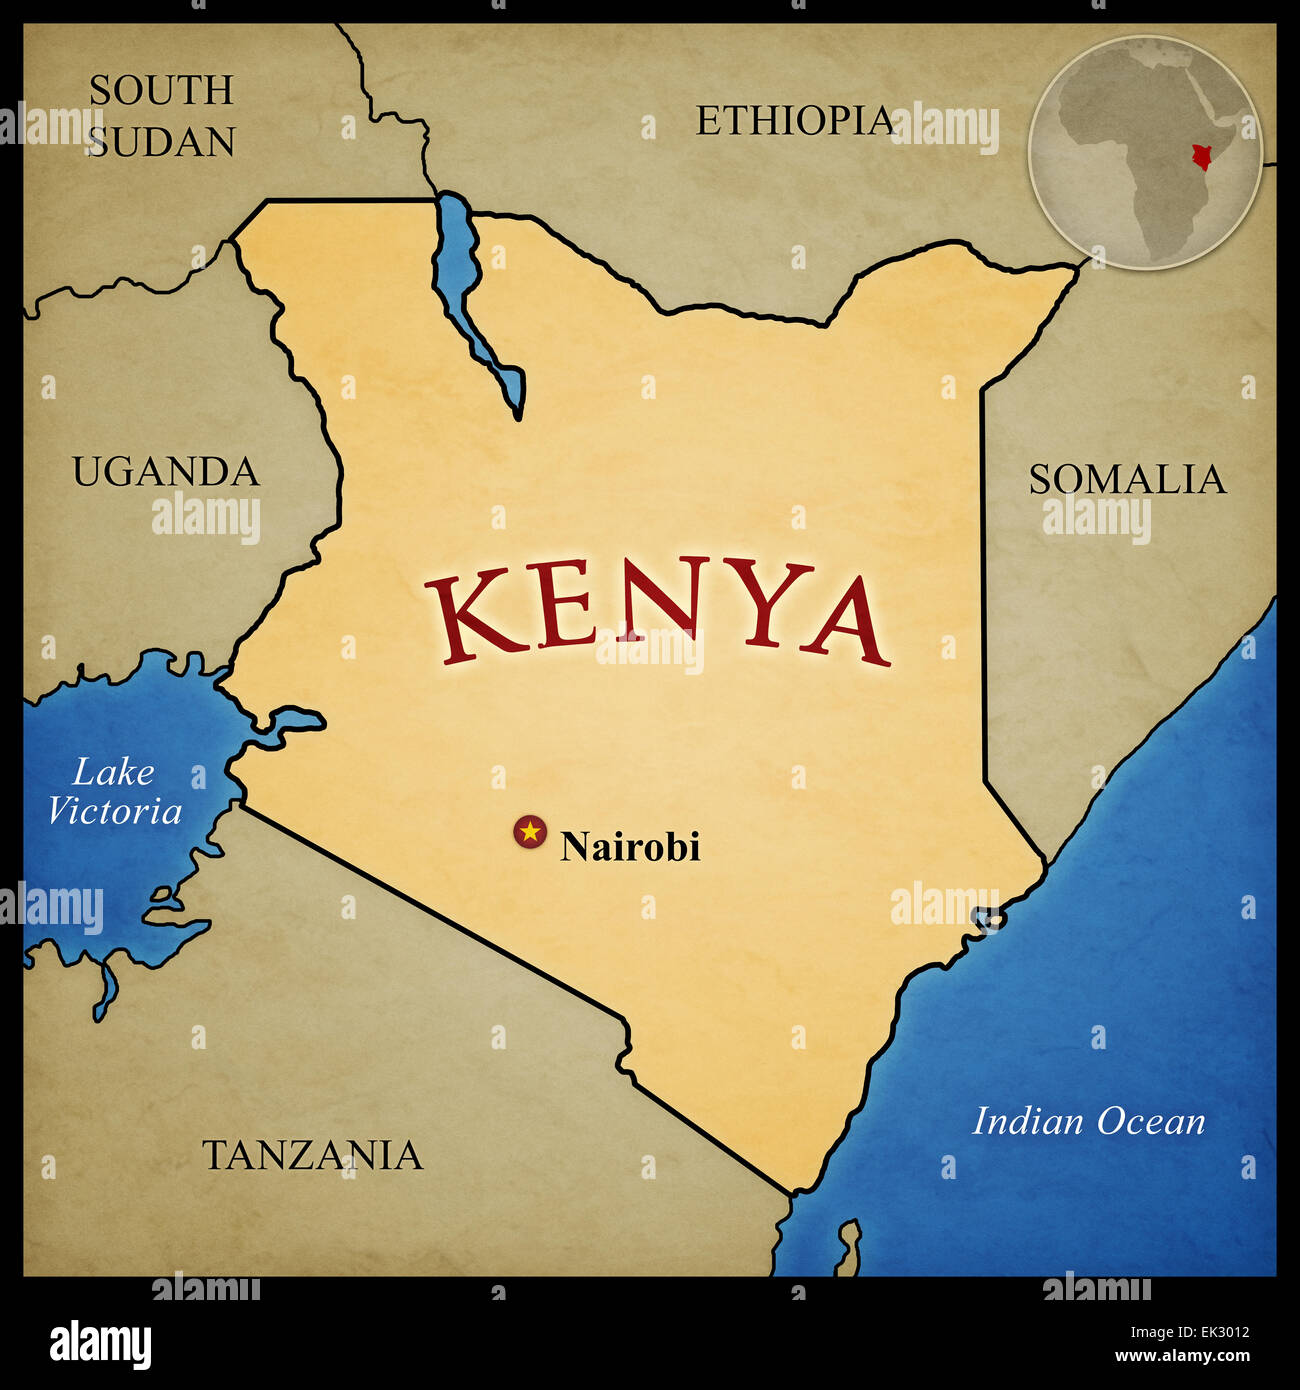 Mapa De Kenia Y Los Paises Limitrofes Con La Capital Nairobi